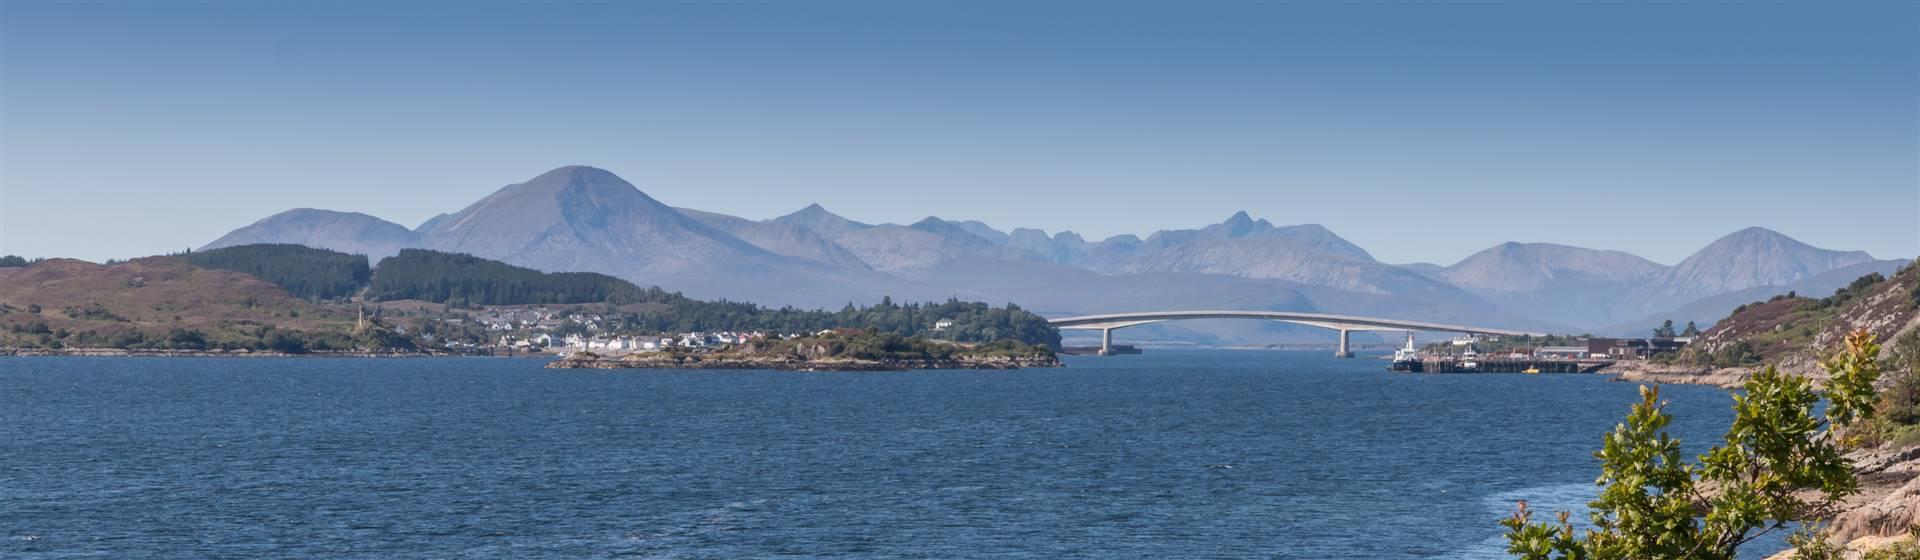 "<img src=""hivoy2021-shutterstock.jpeg"" alt=""Isle of Skye & Skye Bridge""/>"